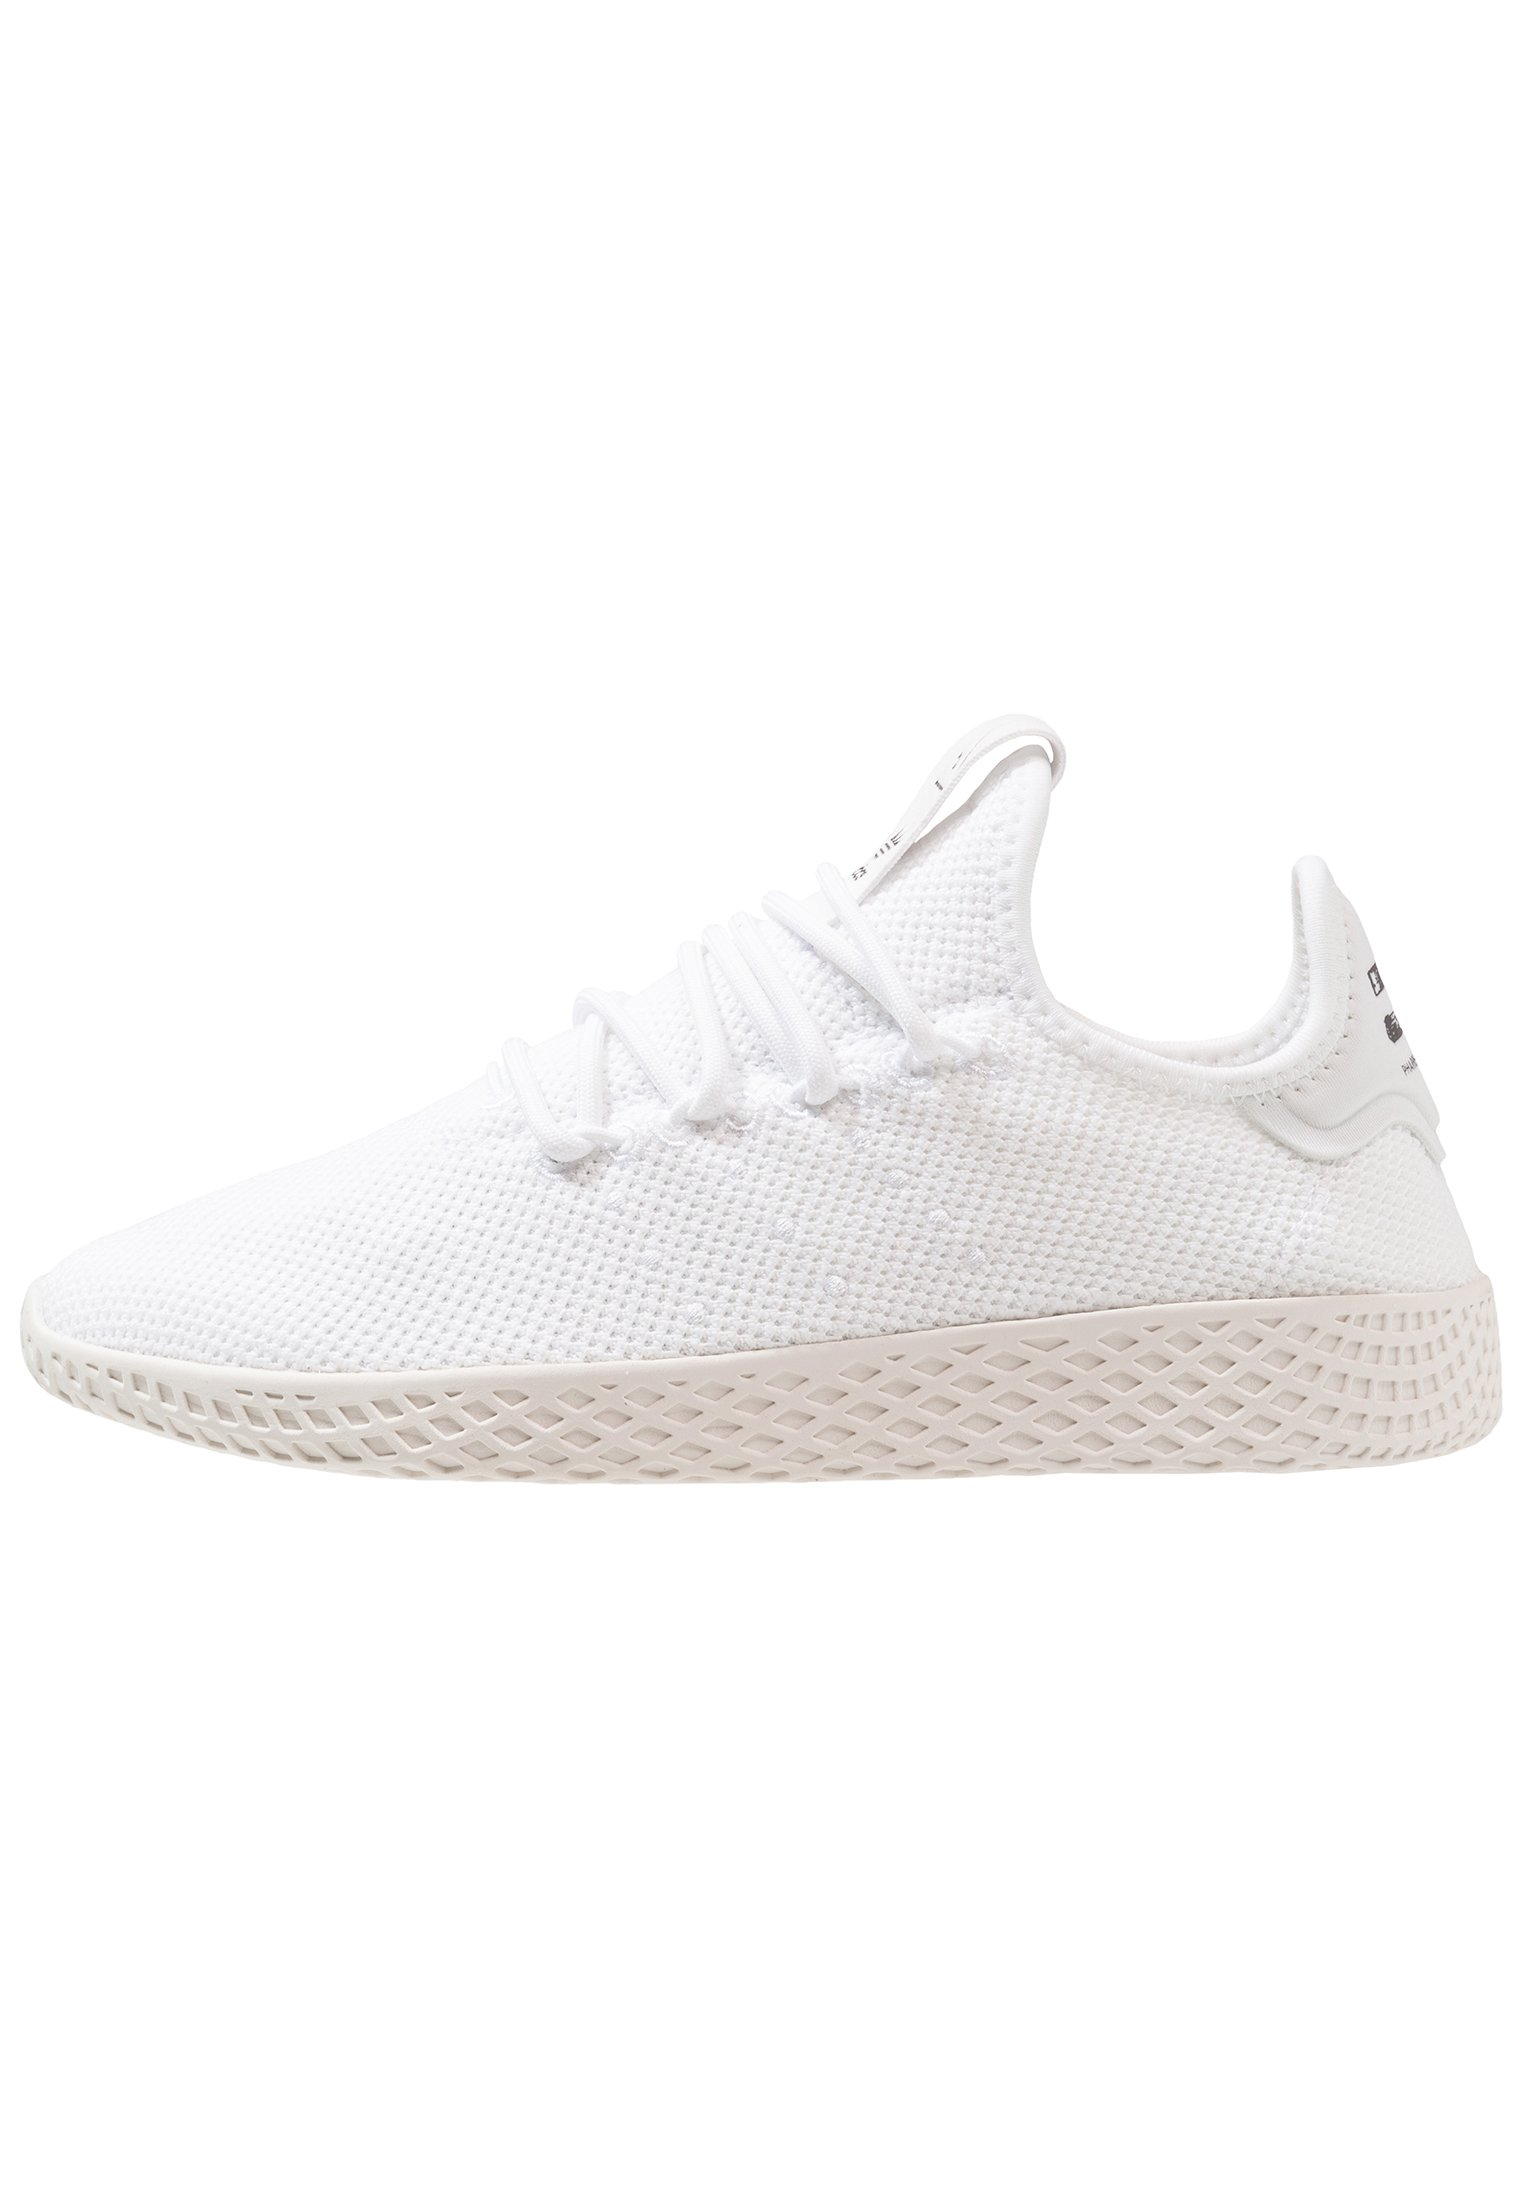 PW TENNIS HU Sneaker low footwear whitecore white